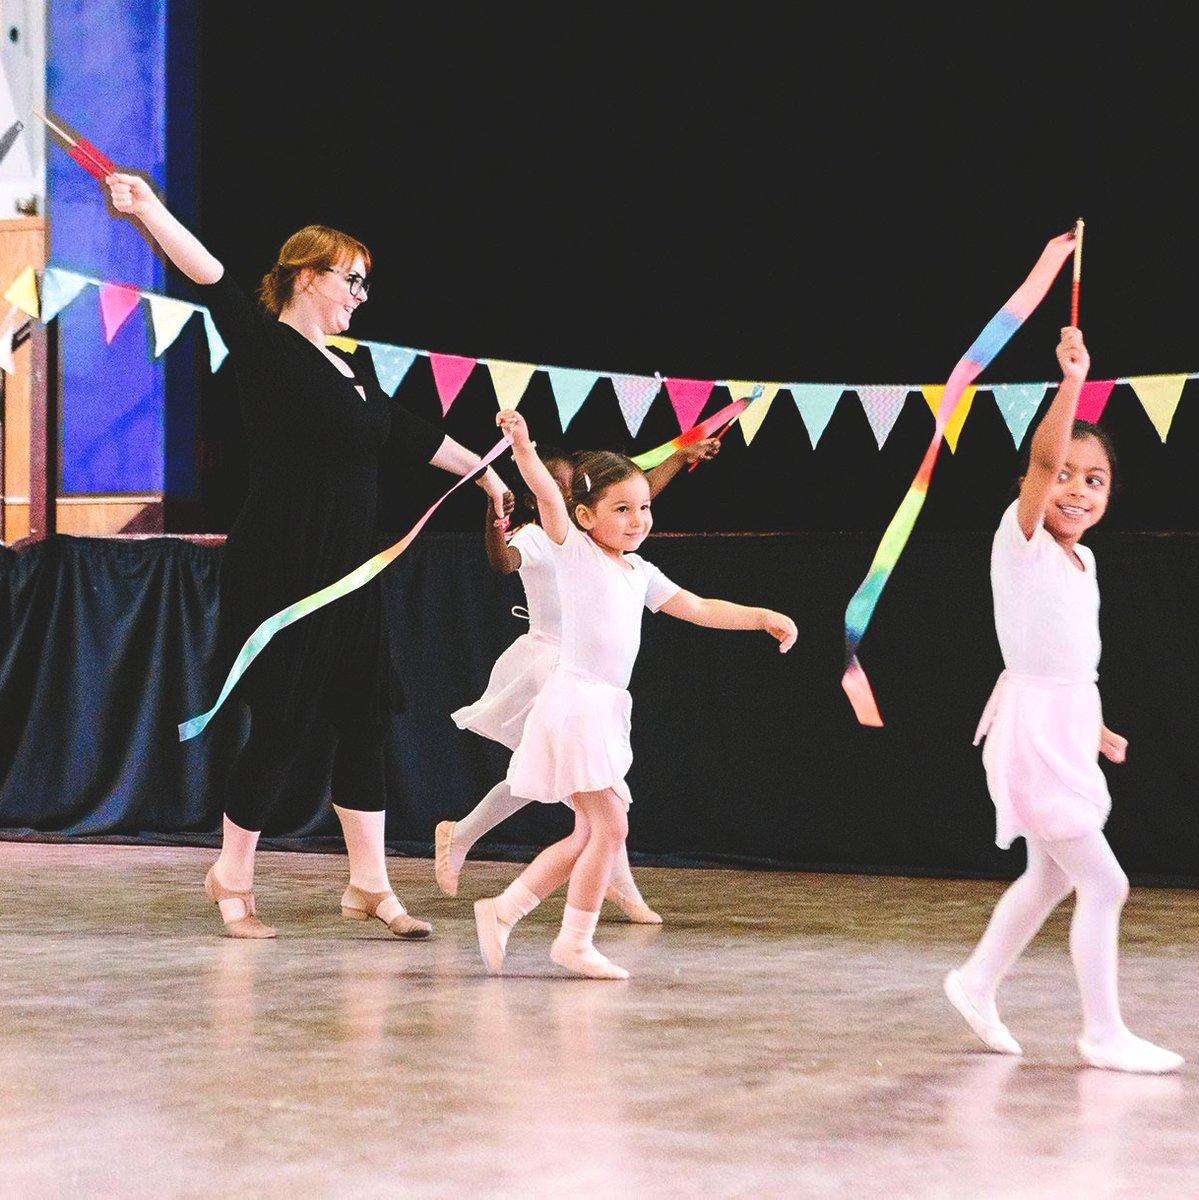 Rainbow is our favorite colour!   Whats yours?  #balletclass #ballet #ballerina #ribbons #rainbows #tippytoes #primaryballet #radballetclasses #radteacher #balletexams #kidsdanceclasses #streatham #norbury #brixton #sw2 #sw16pic.twitter.com/qKg3hQaTqT